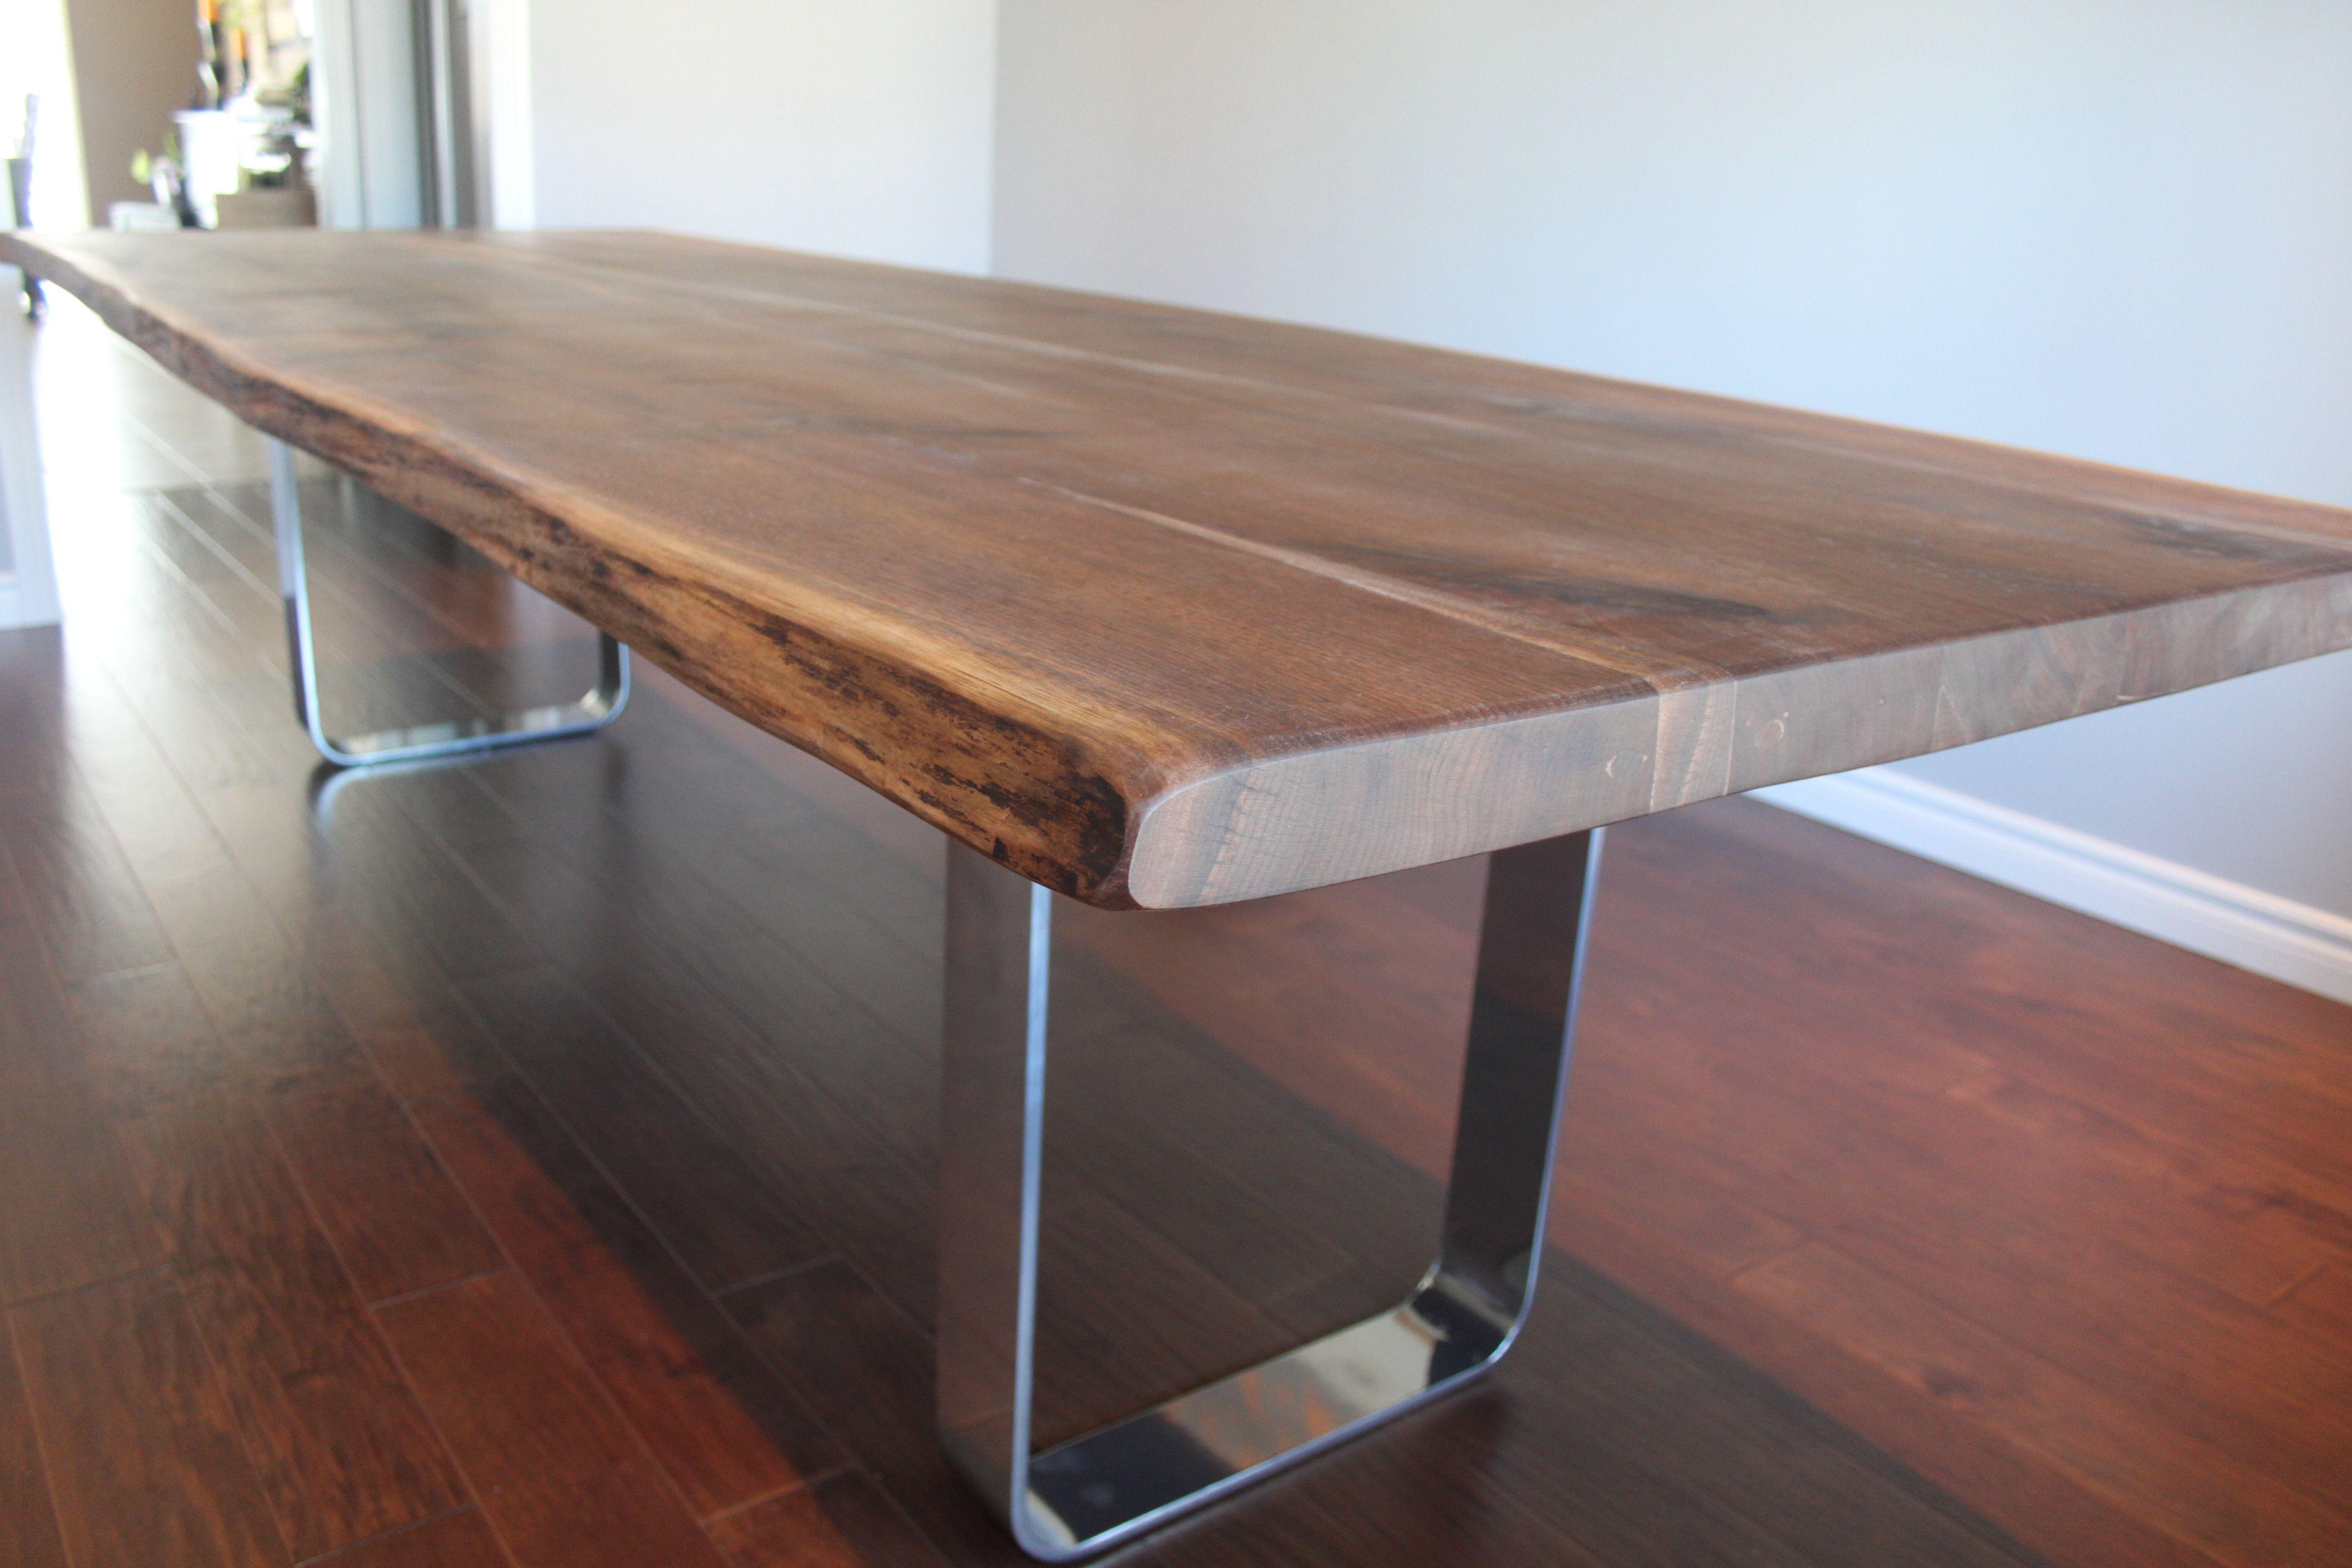 10 Ft Live Edge Black Walnut Dining Table Living Wood Design Reclaimed Craft Custom Furniture